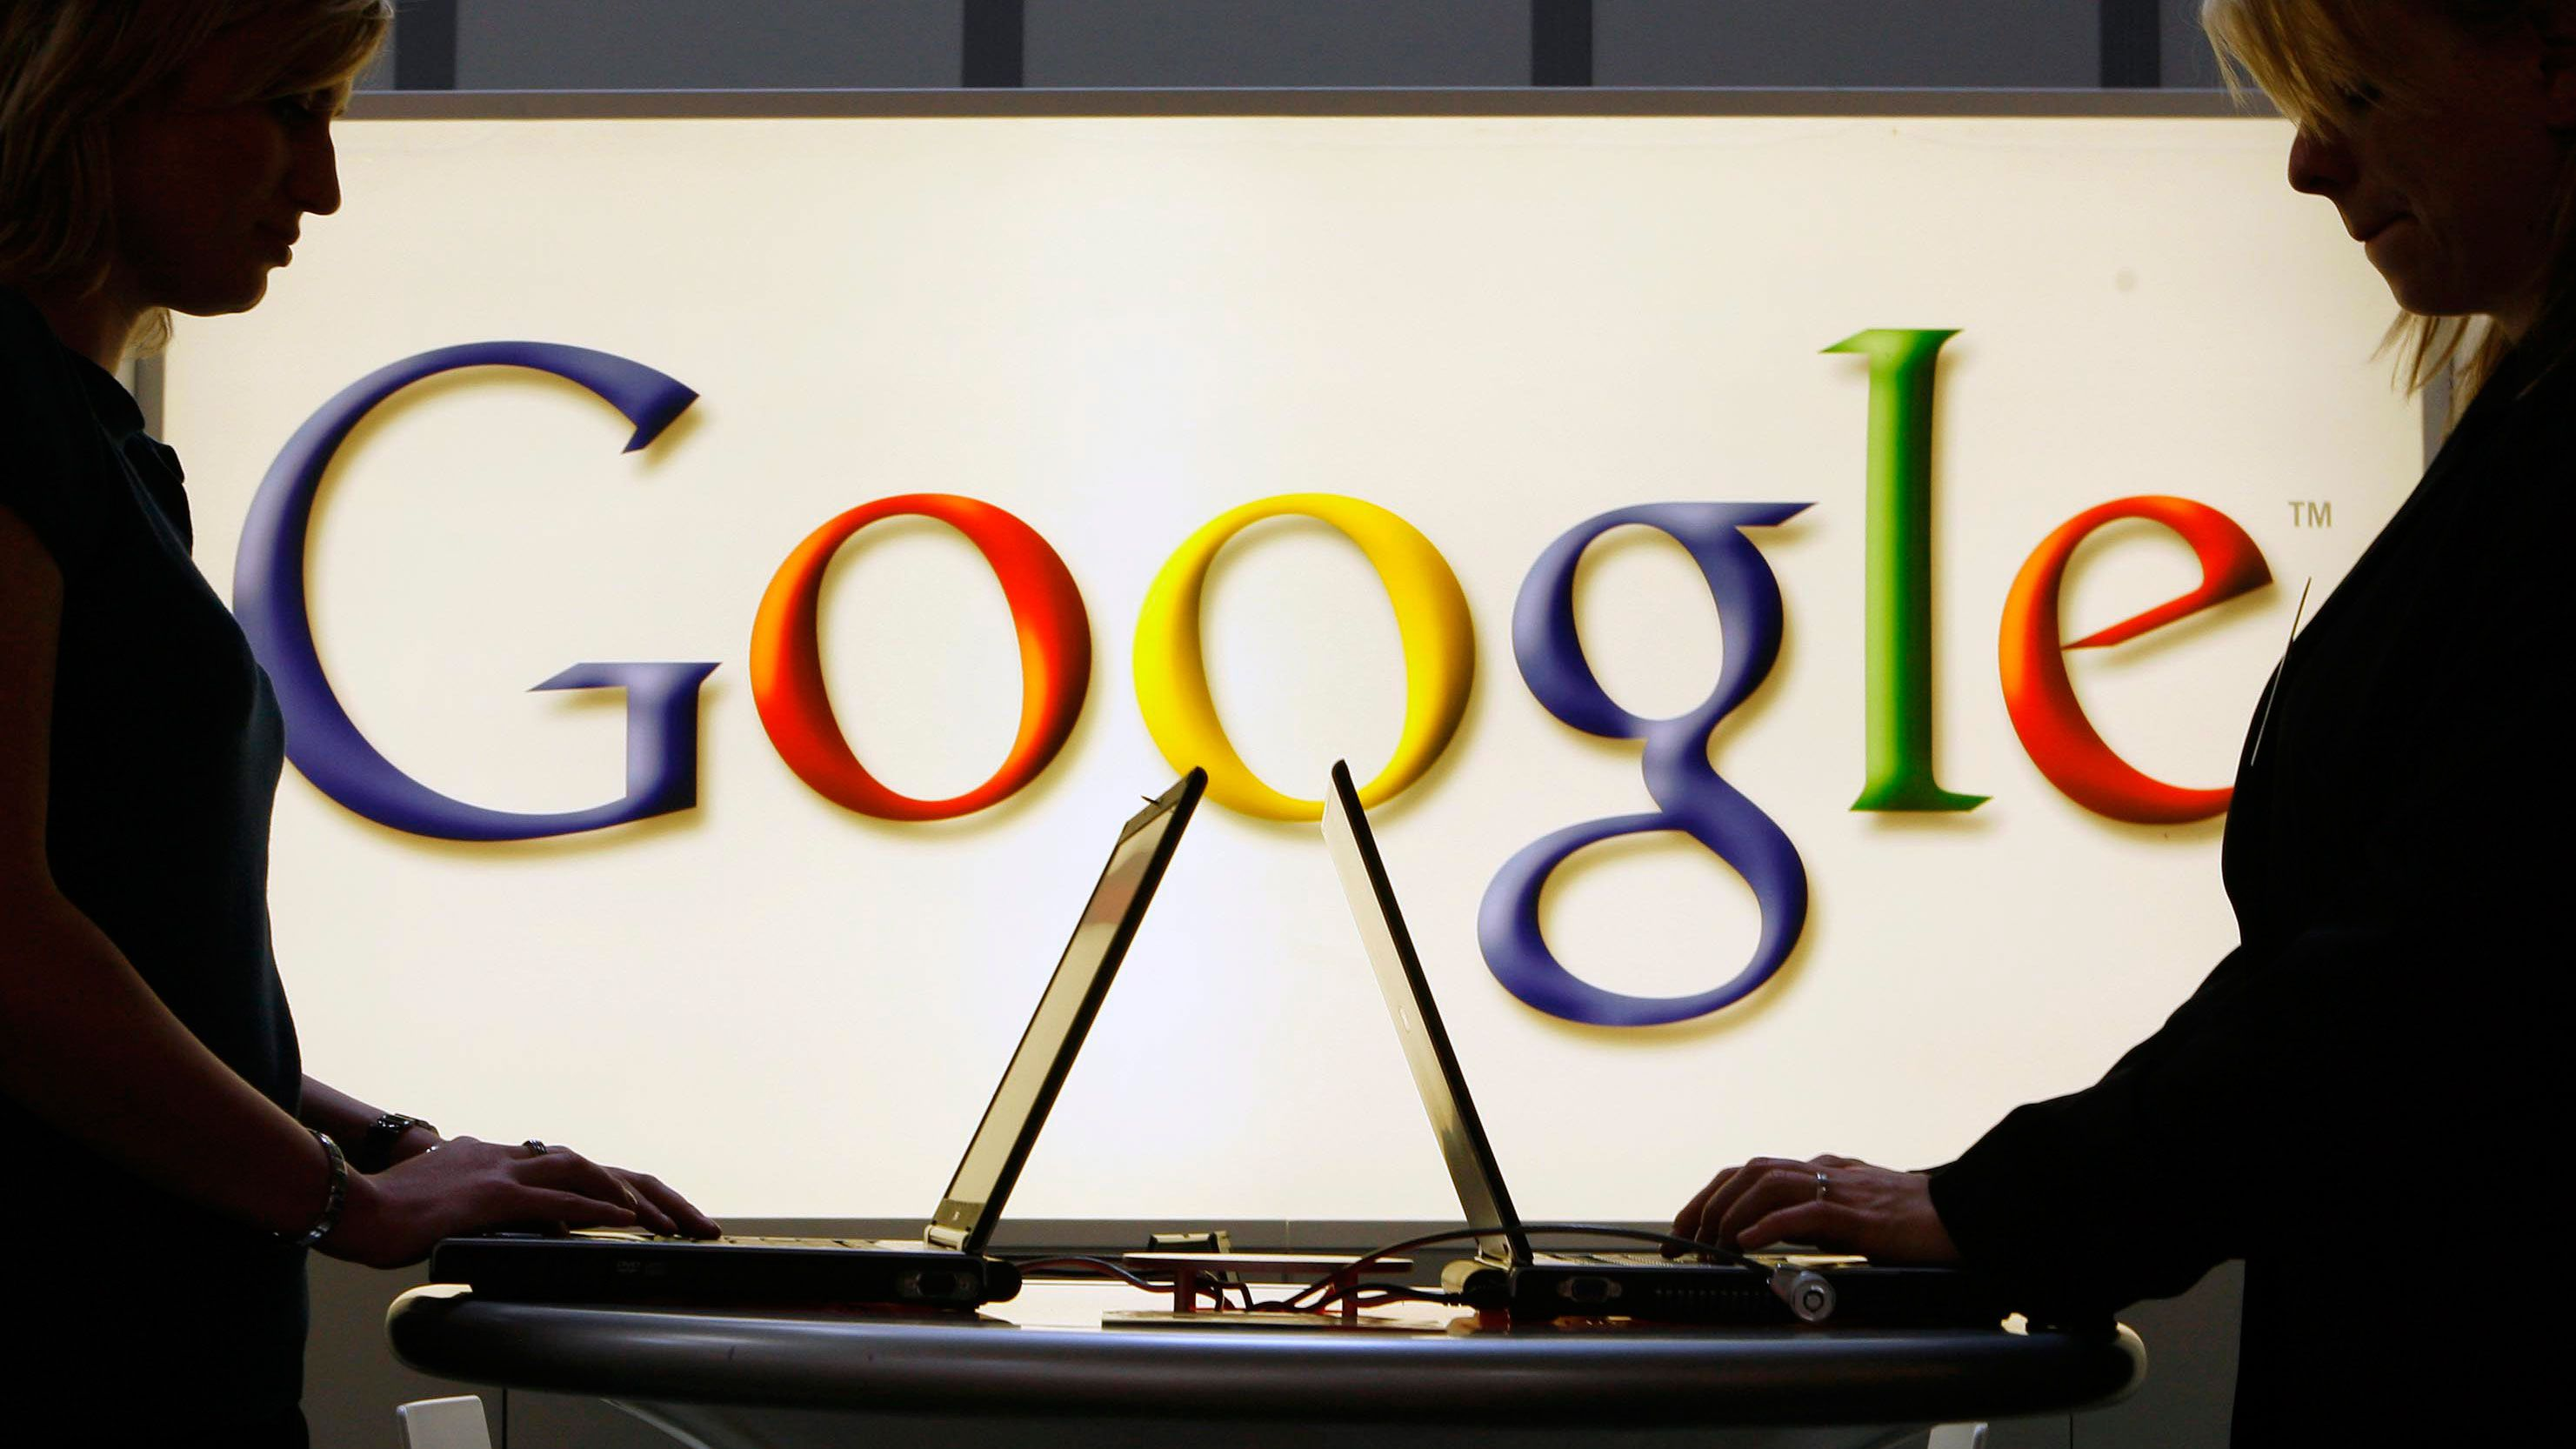 google-falling-cpc-facebook-threat